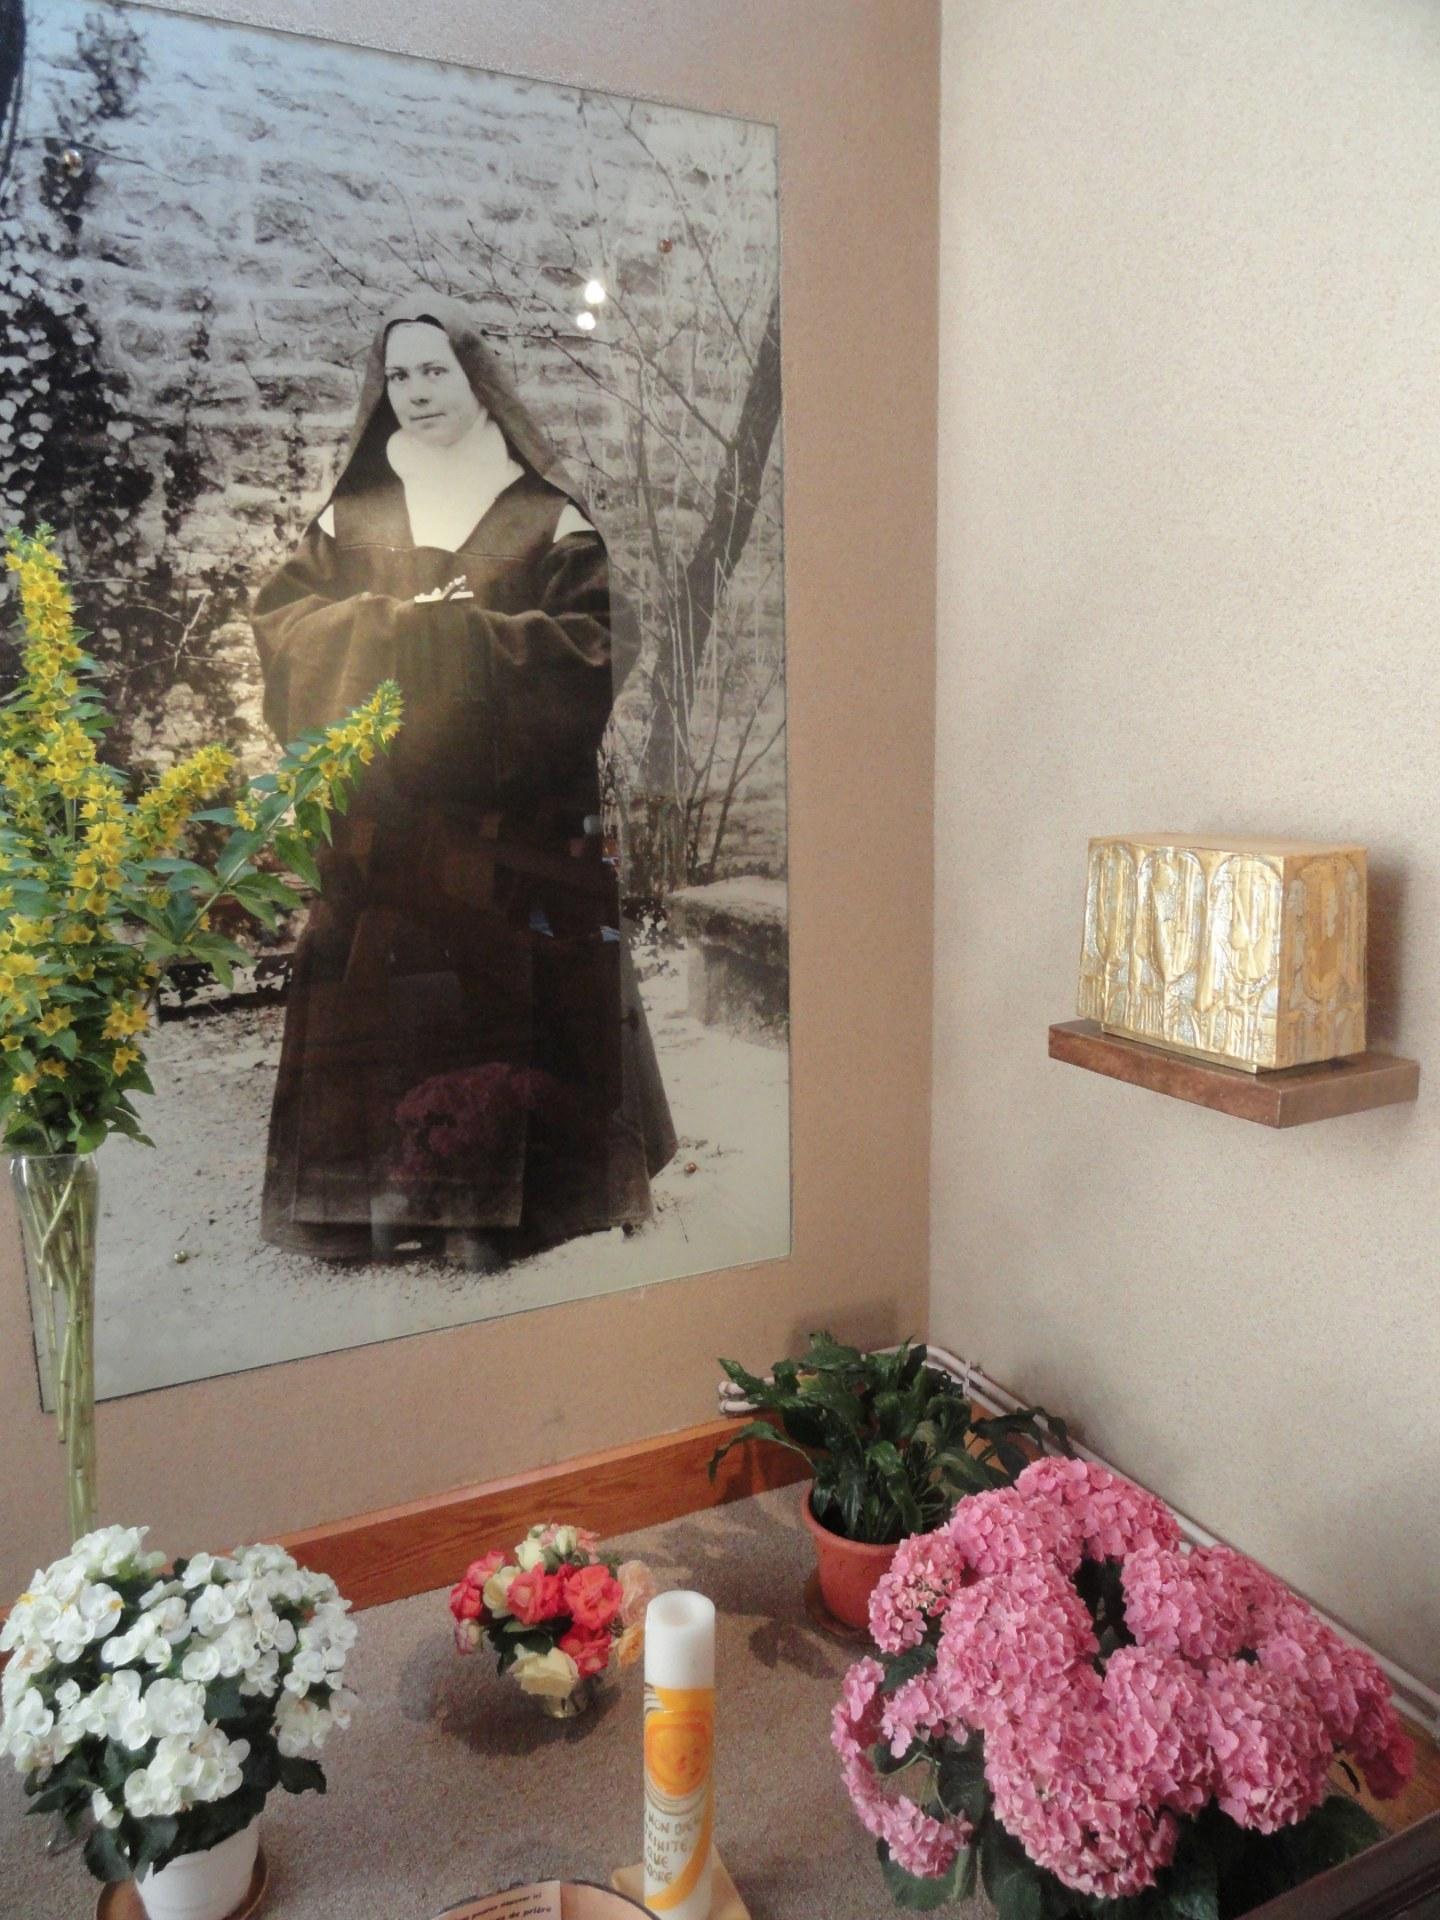 2017-06-16 - Pe#lerinage en Bourgogne - 173